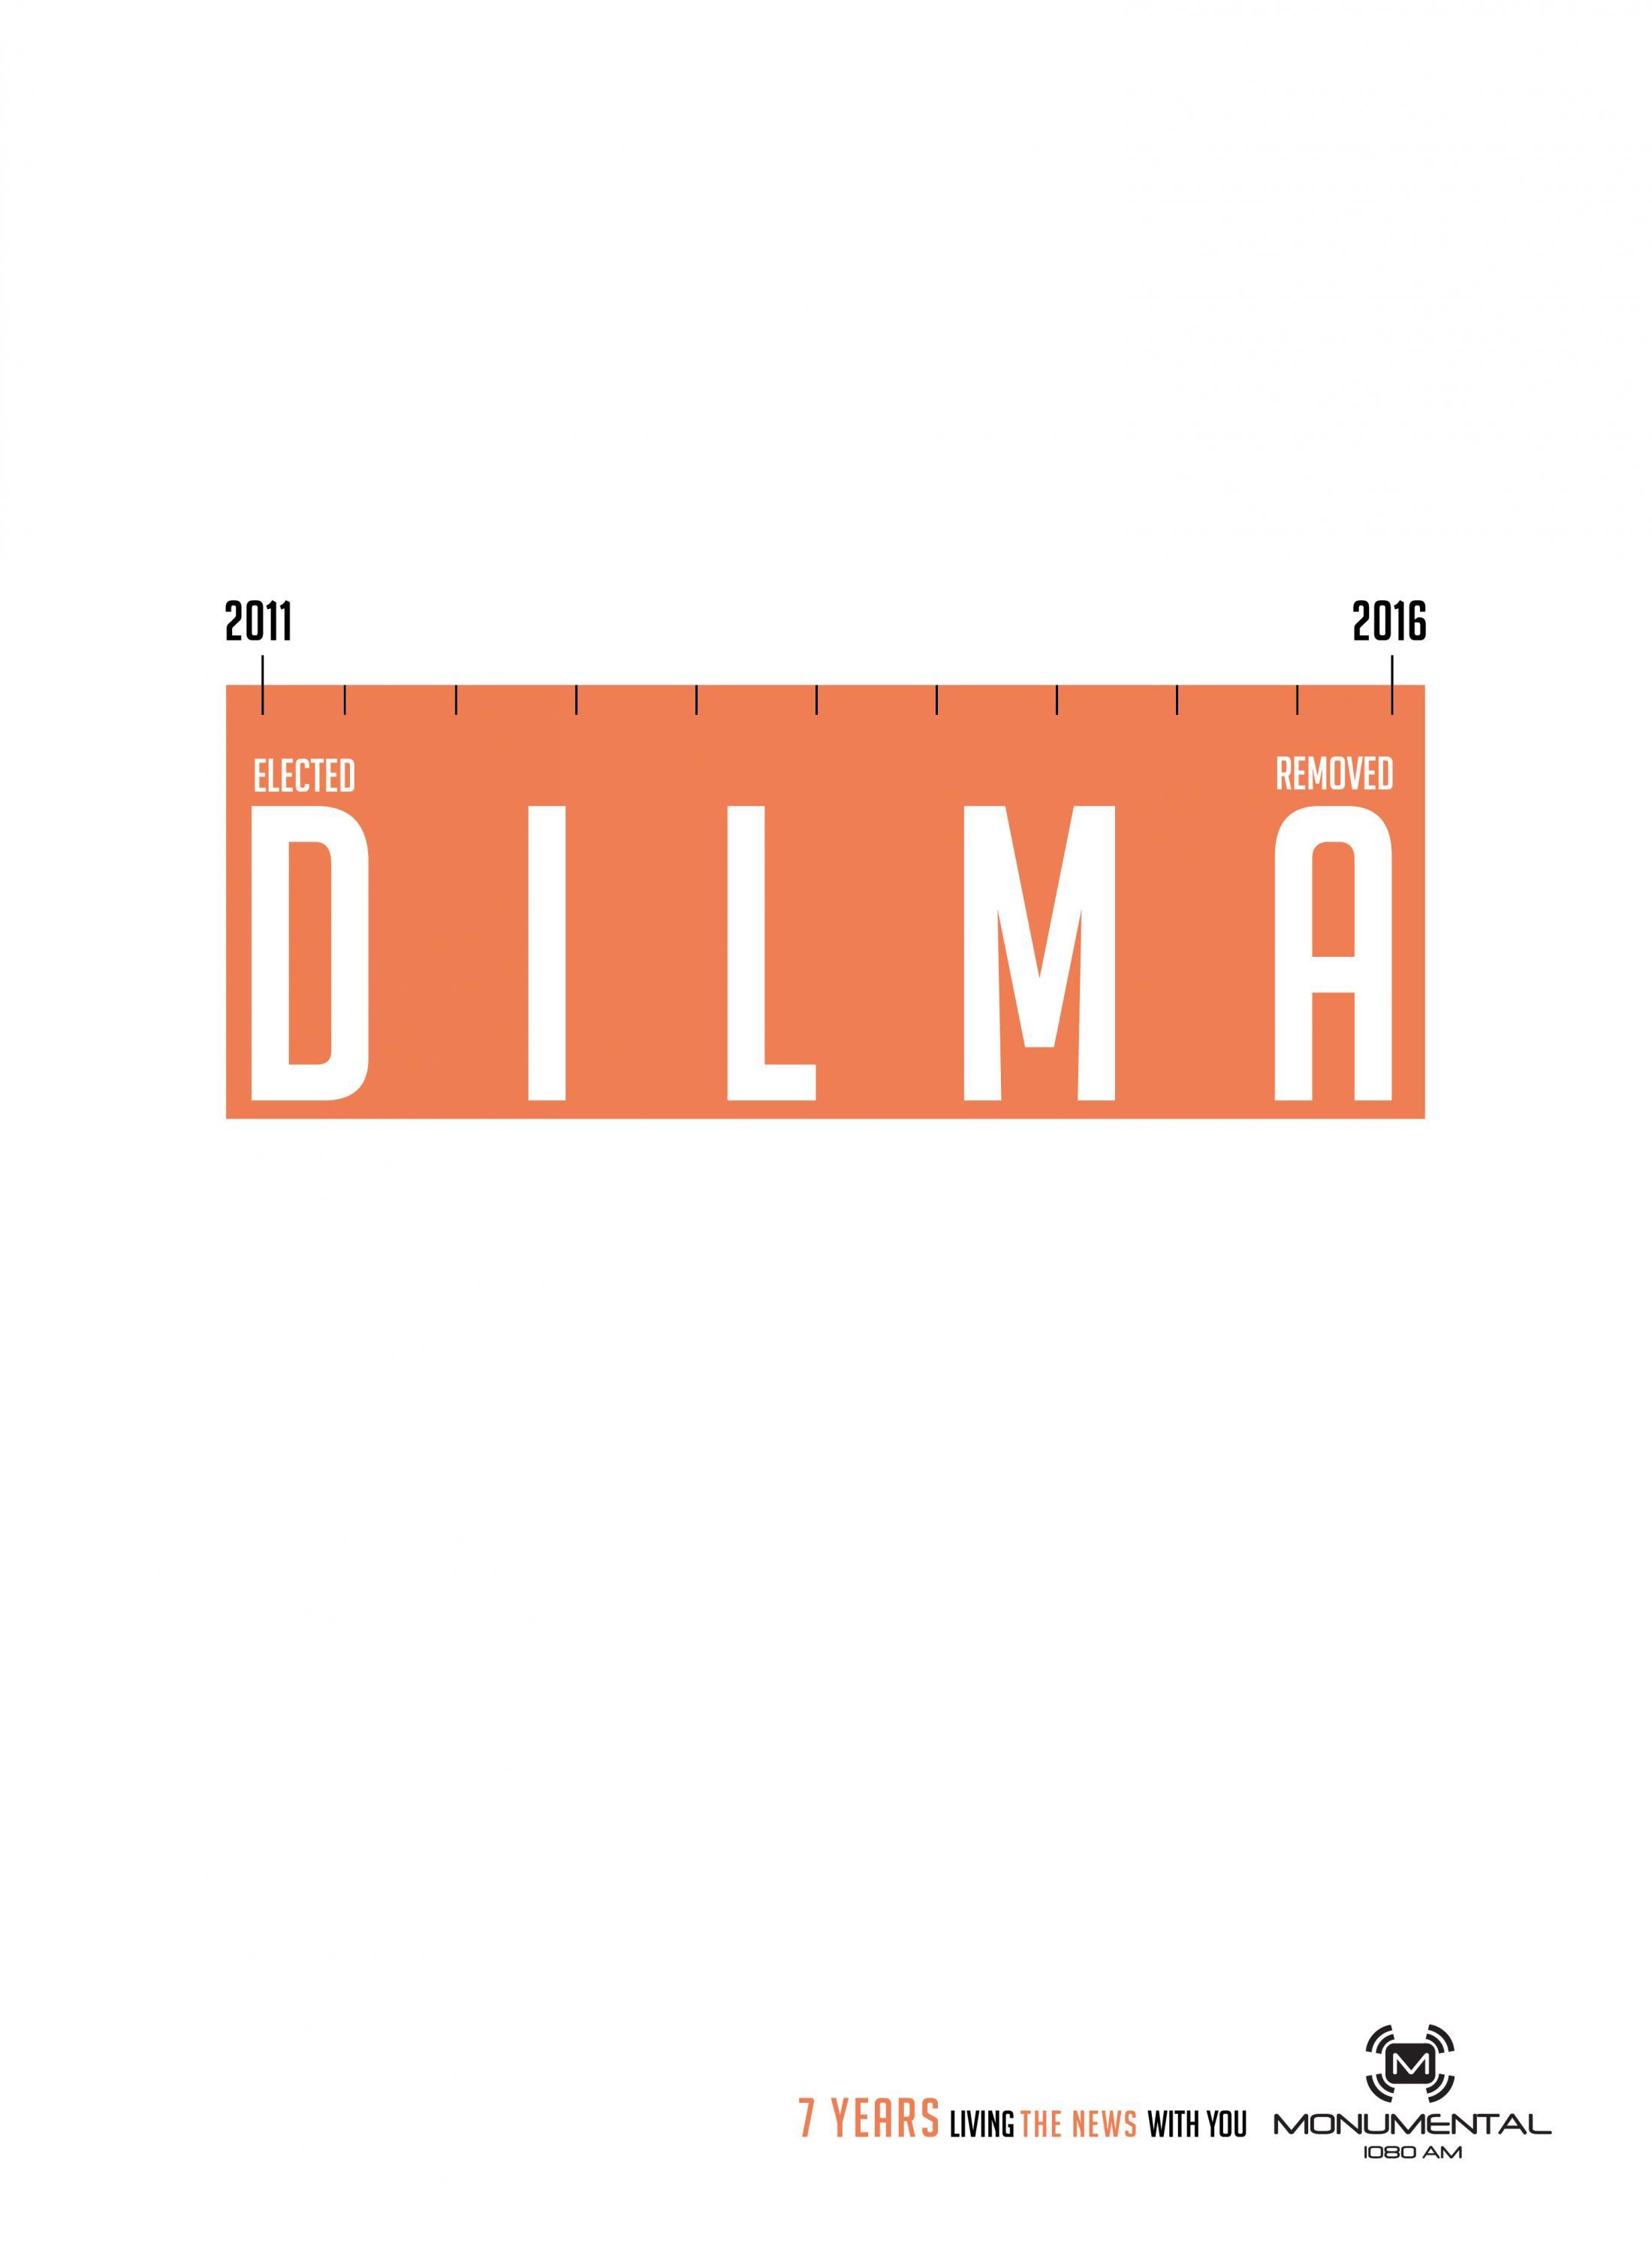 Monumental Print Ad - Monumental 7th Anniversary - Dilma